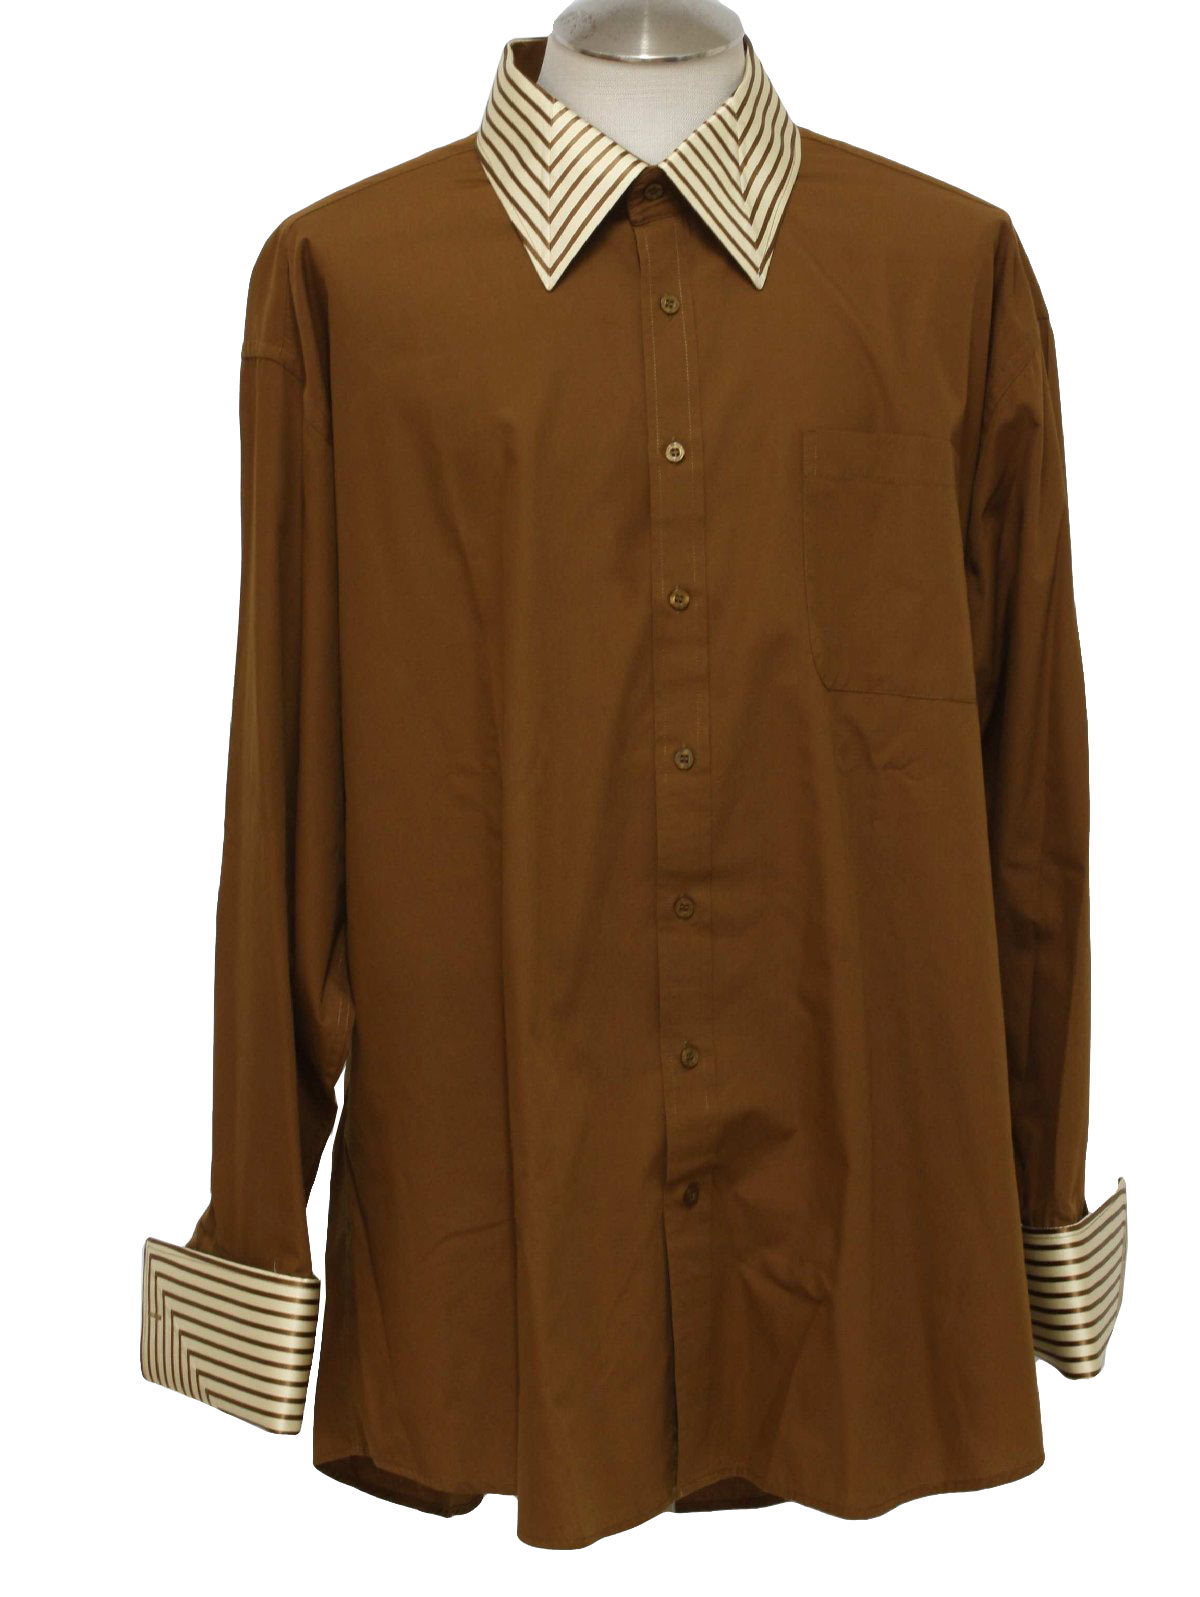 Vintage 1980 39 s shirt 80s daniel ellissa mens warm brown Daniel ellissa men s dress shirts